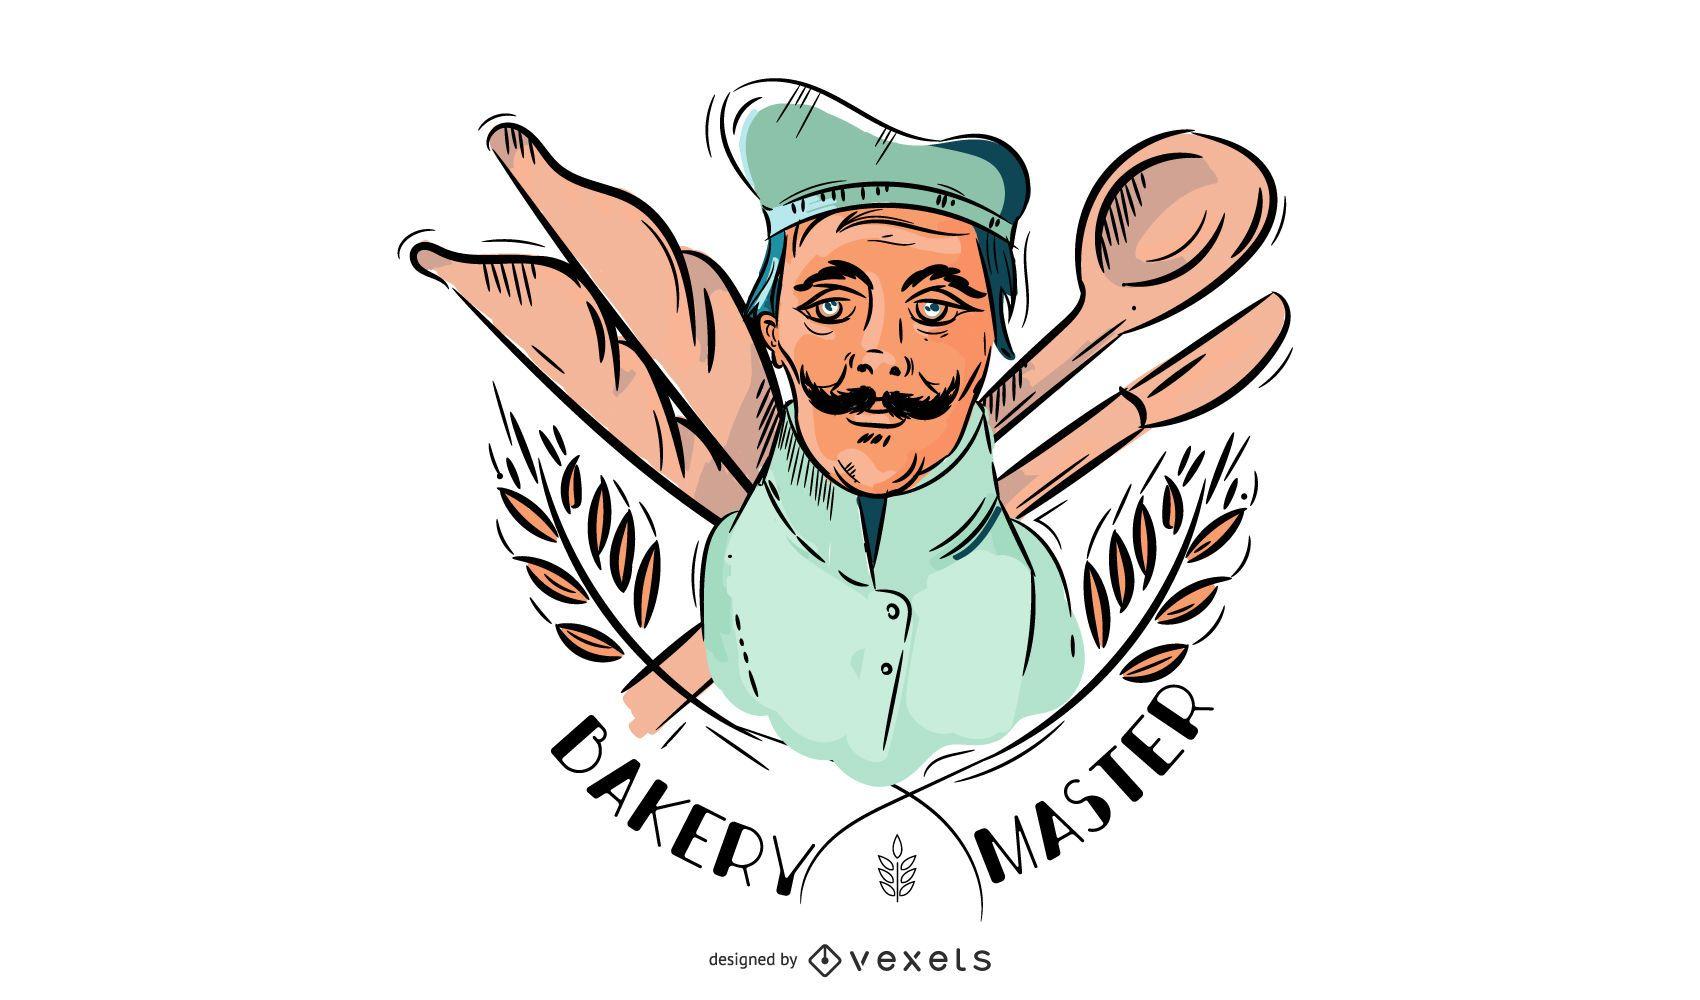 Bakery master illustration